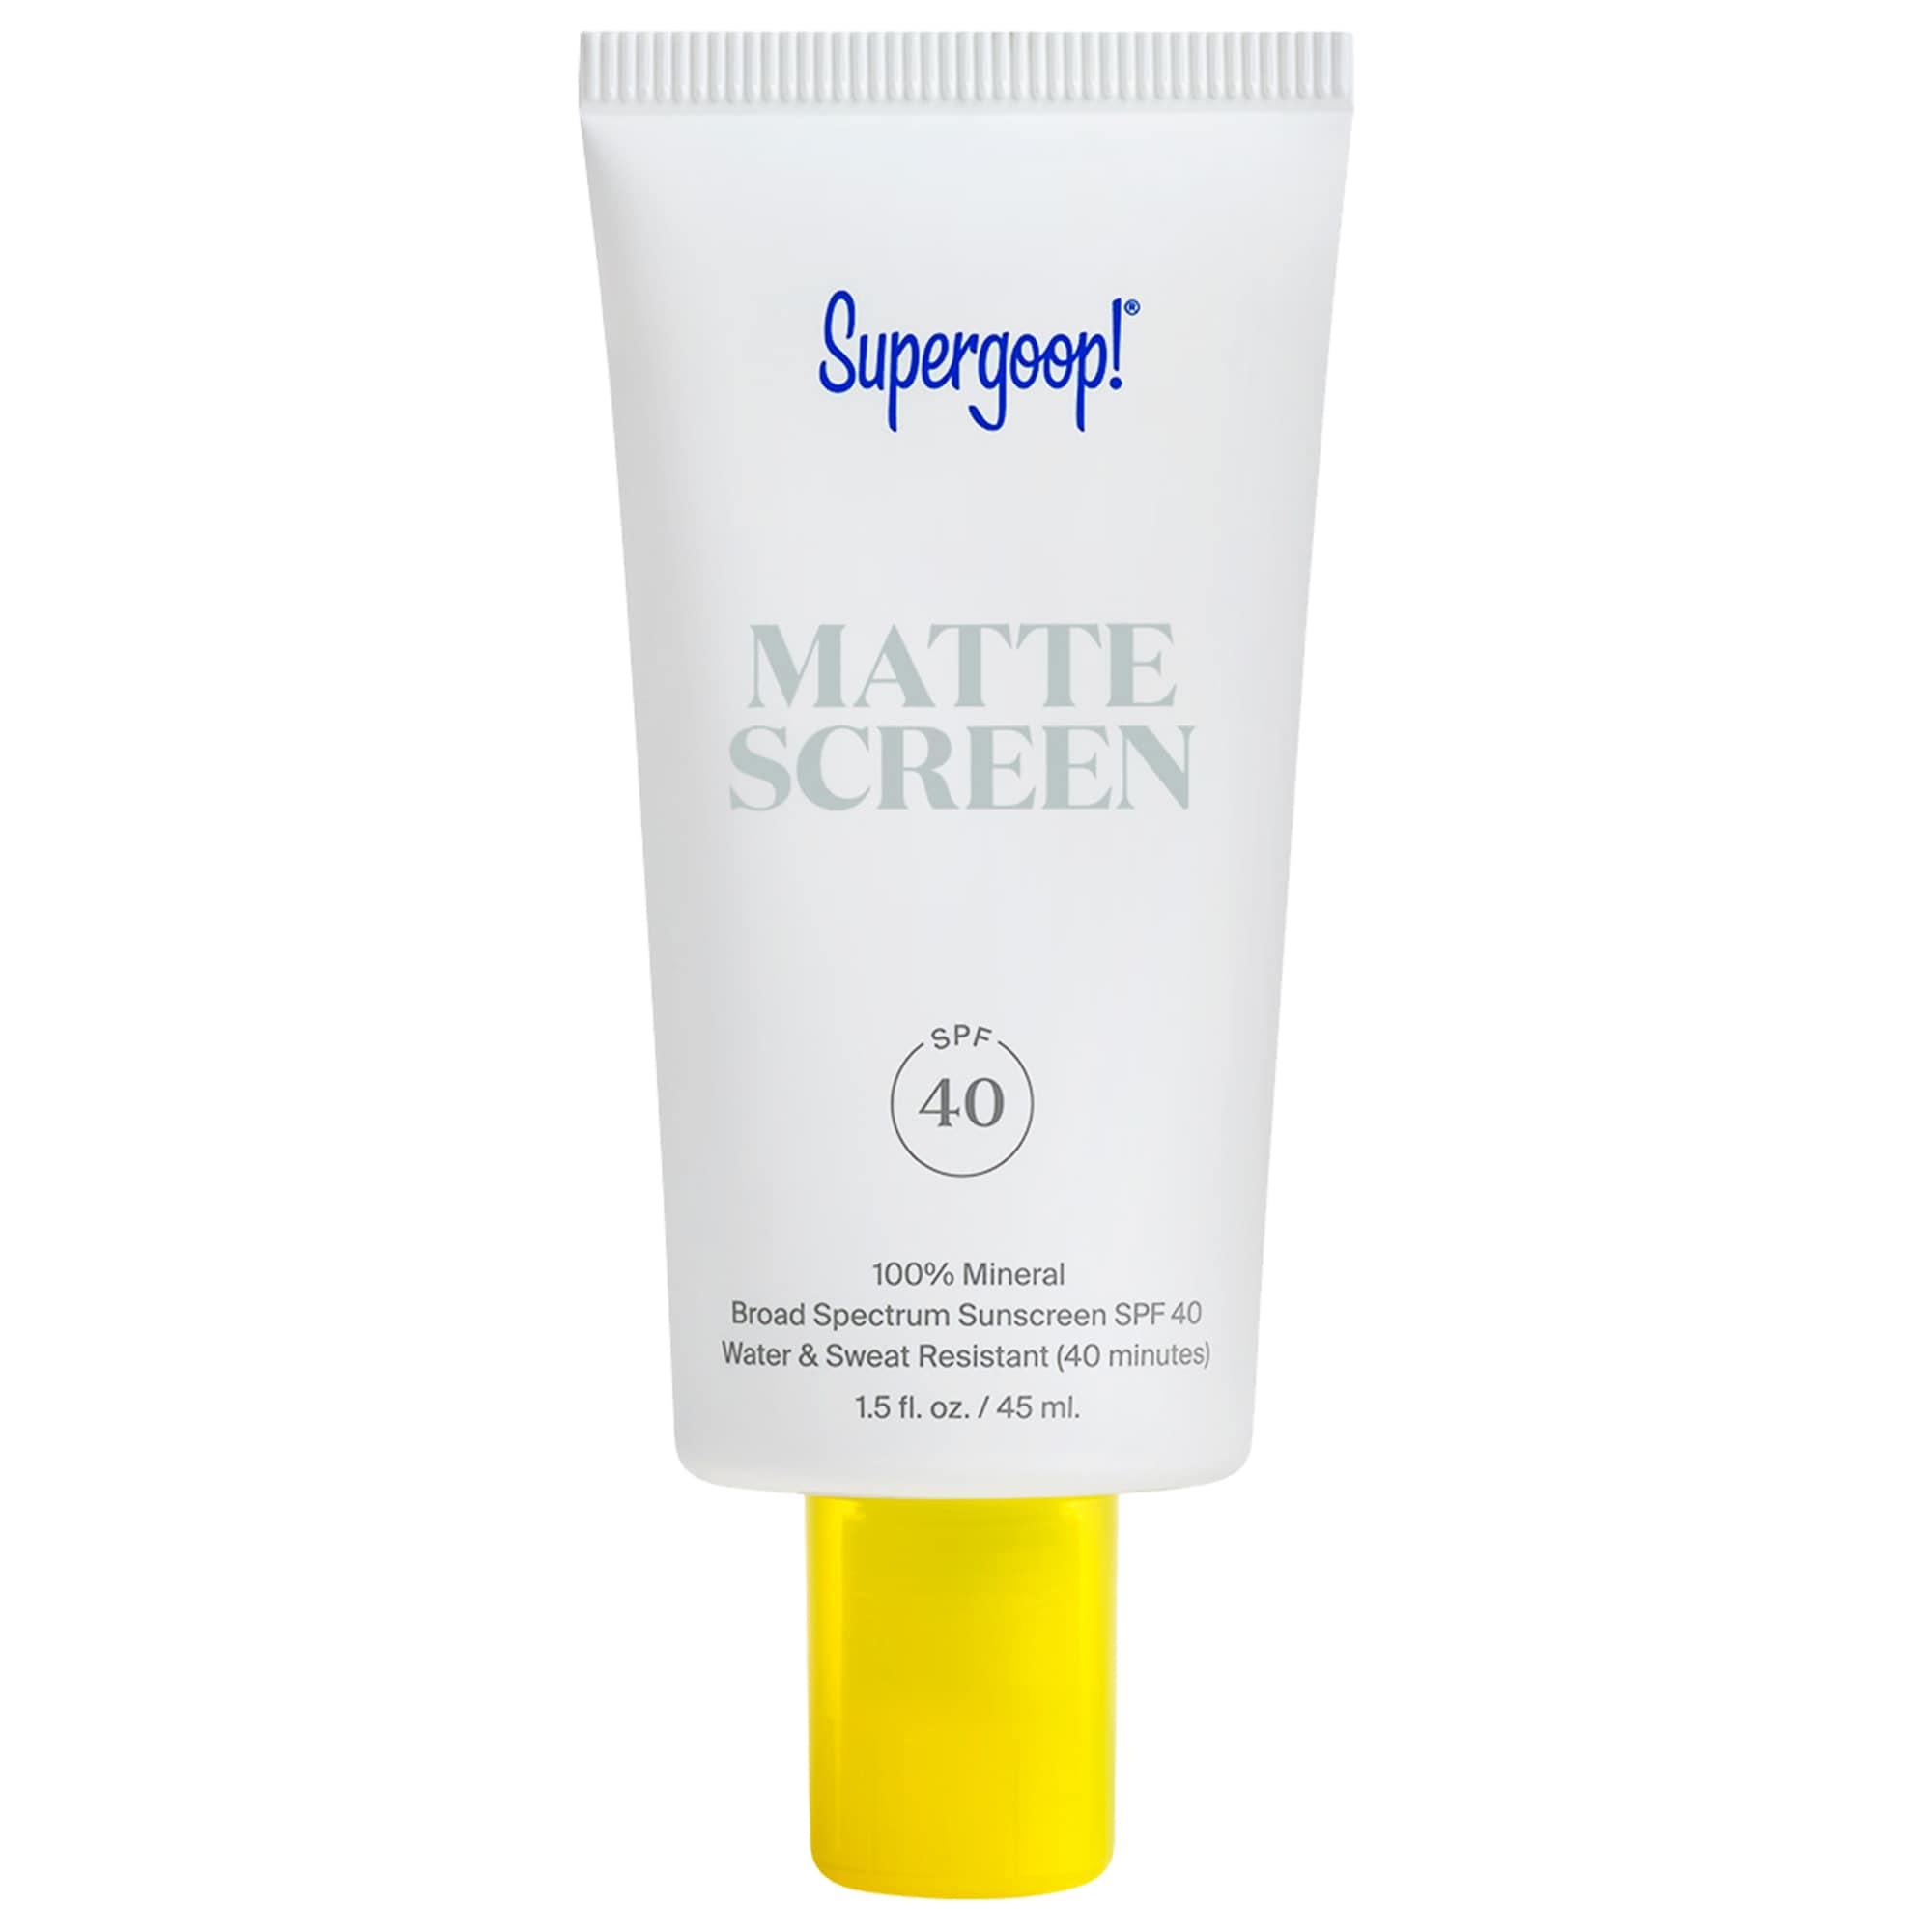 Supergoop! - 100% Mineral Smooth & Poreless Matte Screen SPF 40